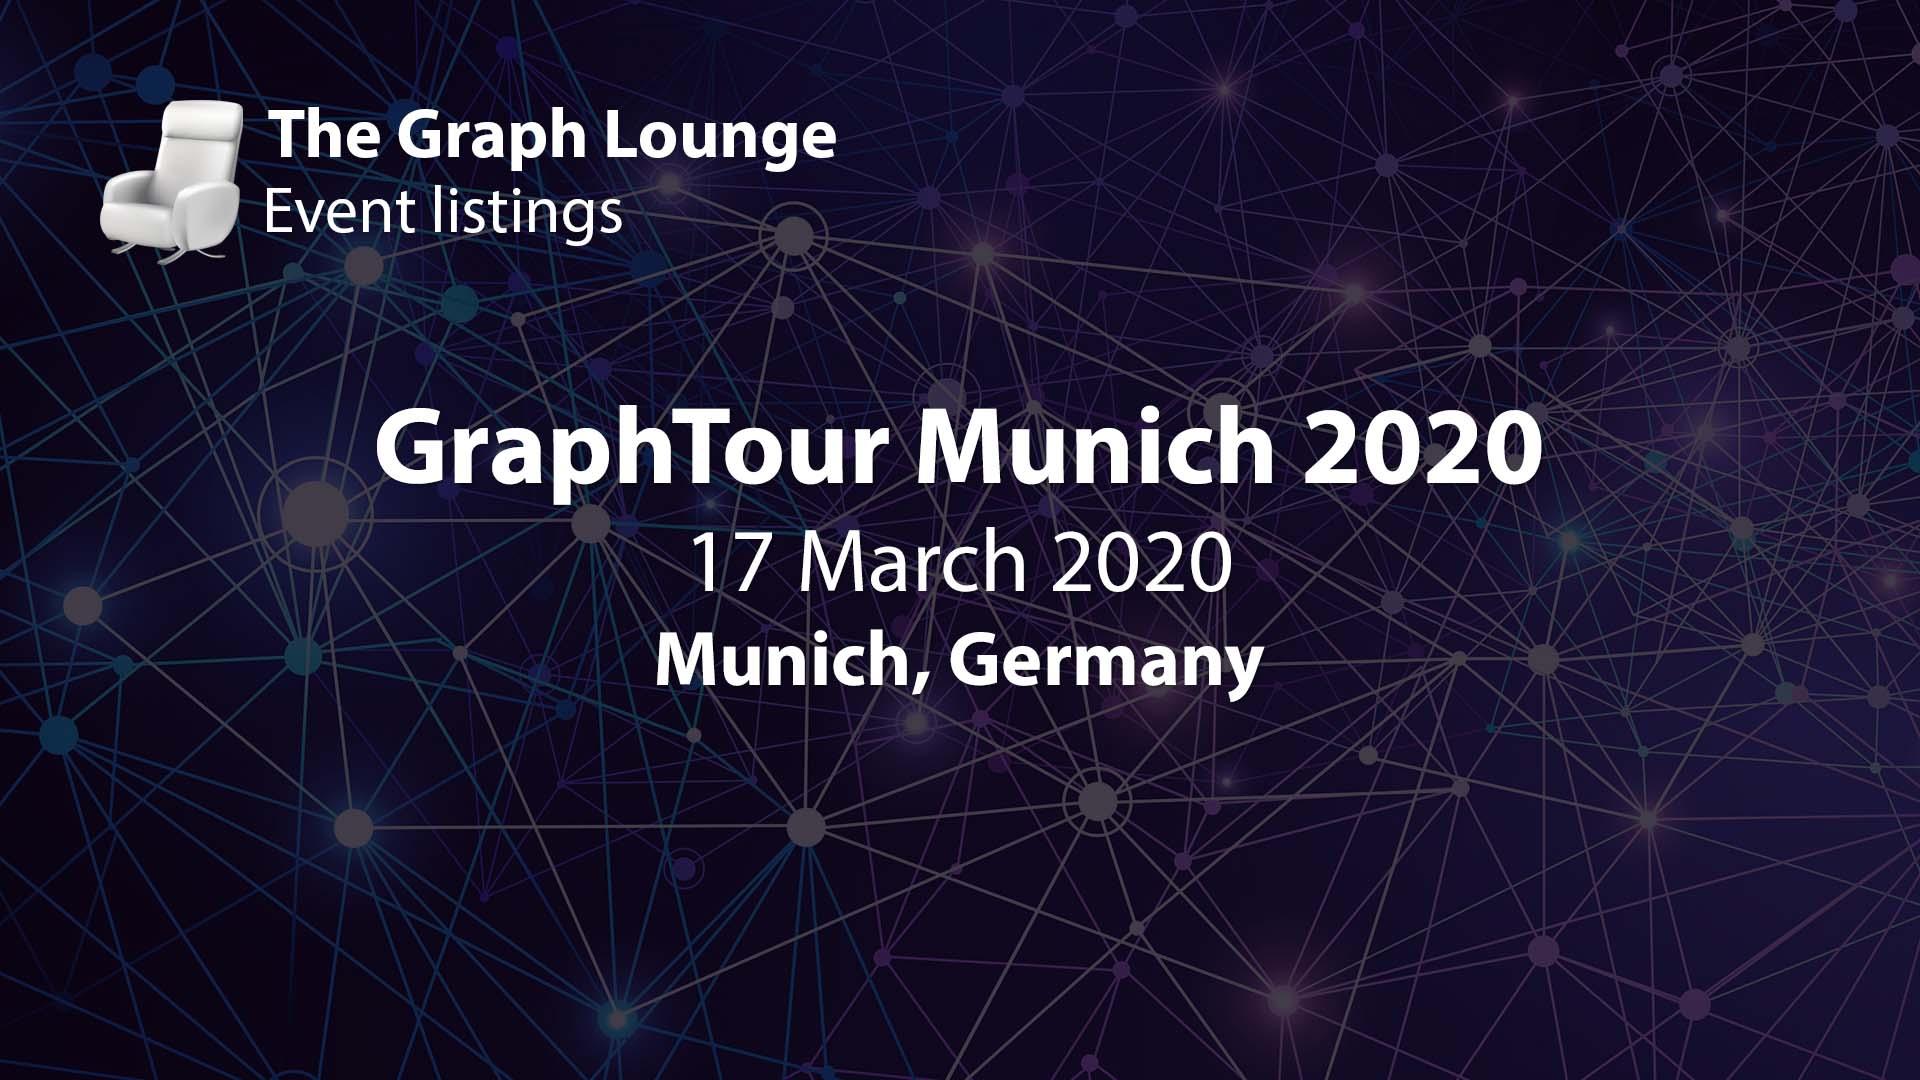 GraphTour Munich 2020